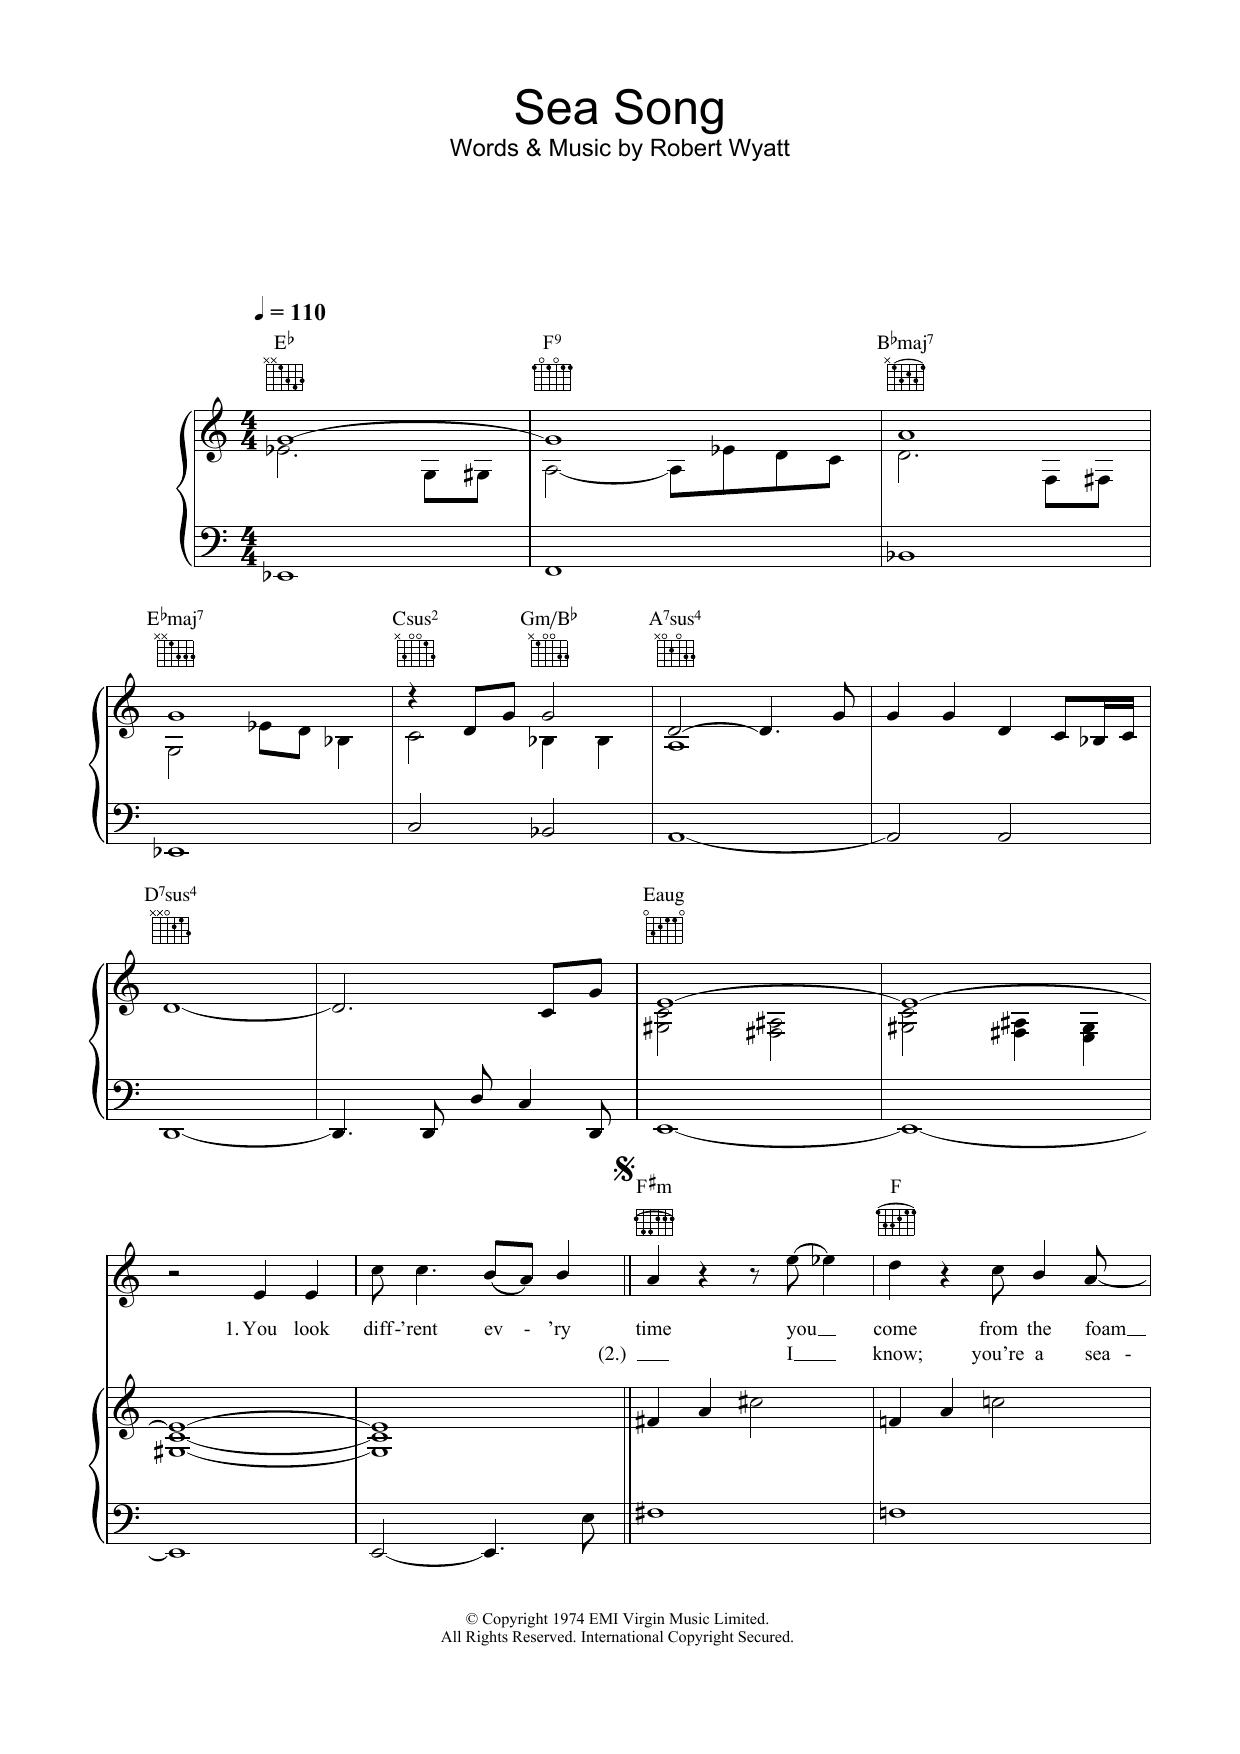 Sea Song sheet music